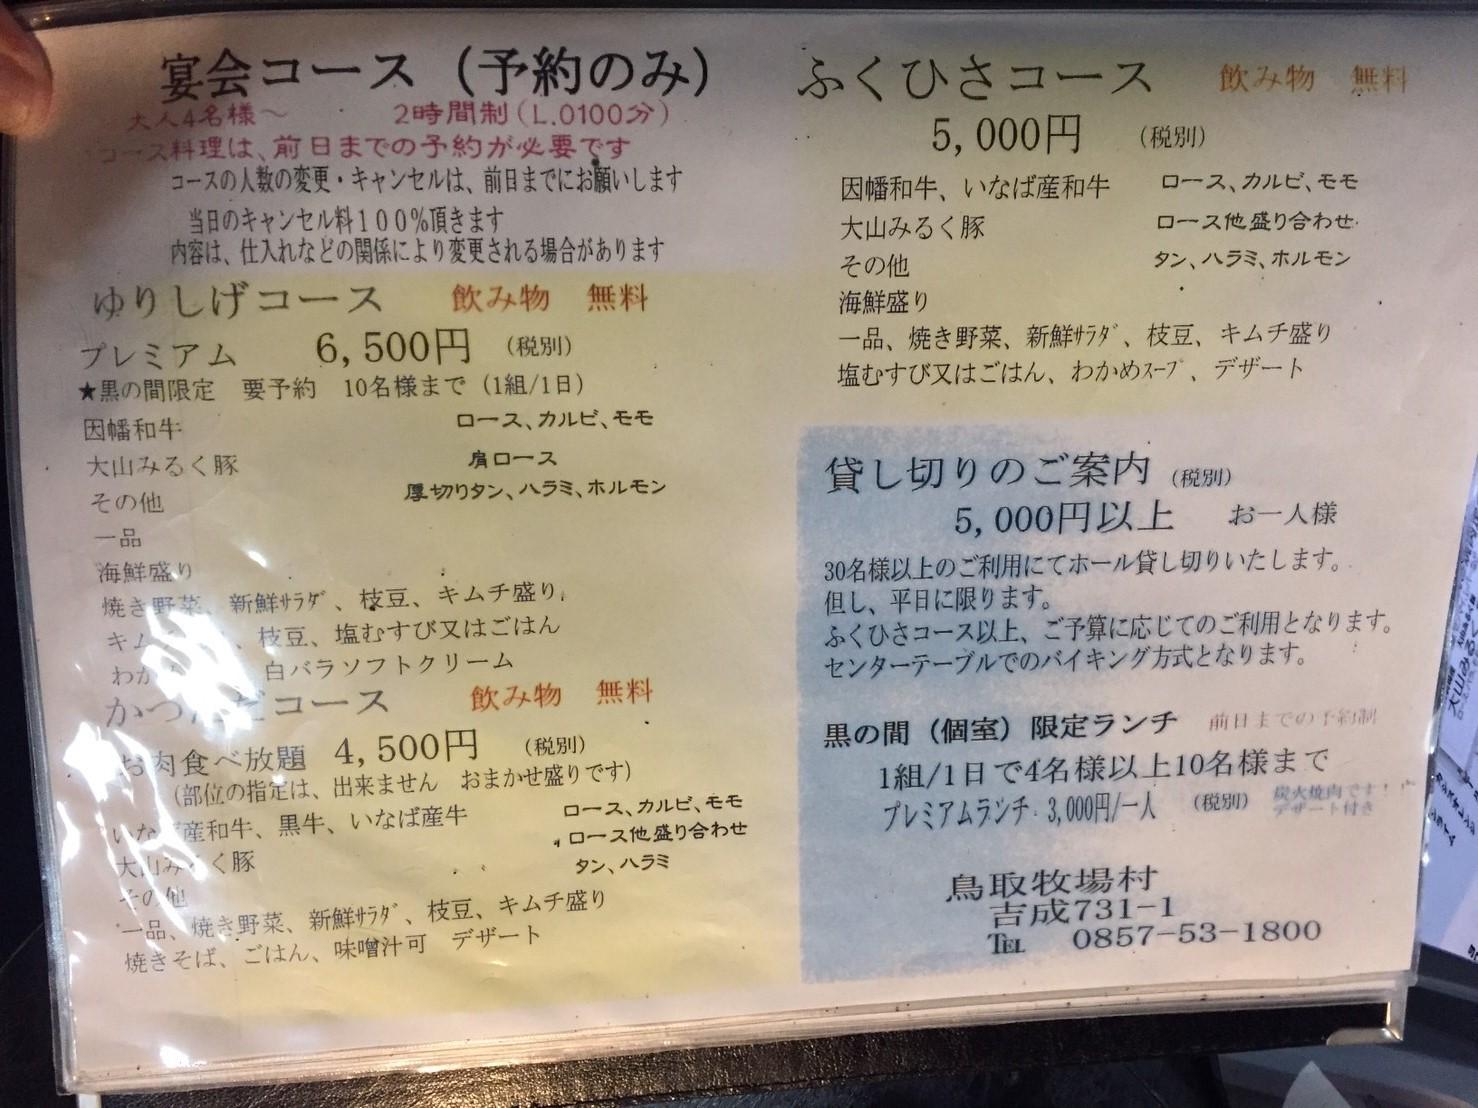 焼肉 鳥取牧場村 厚切りタン・山葵塩_e0115904_07554764.jpg